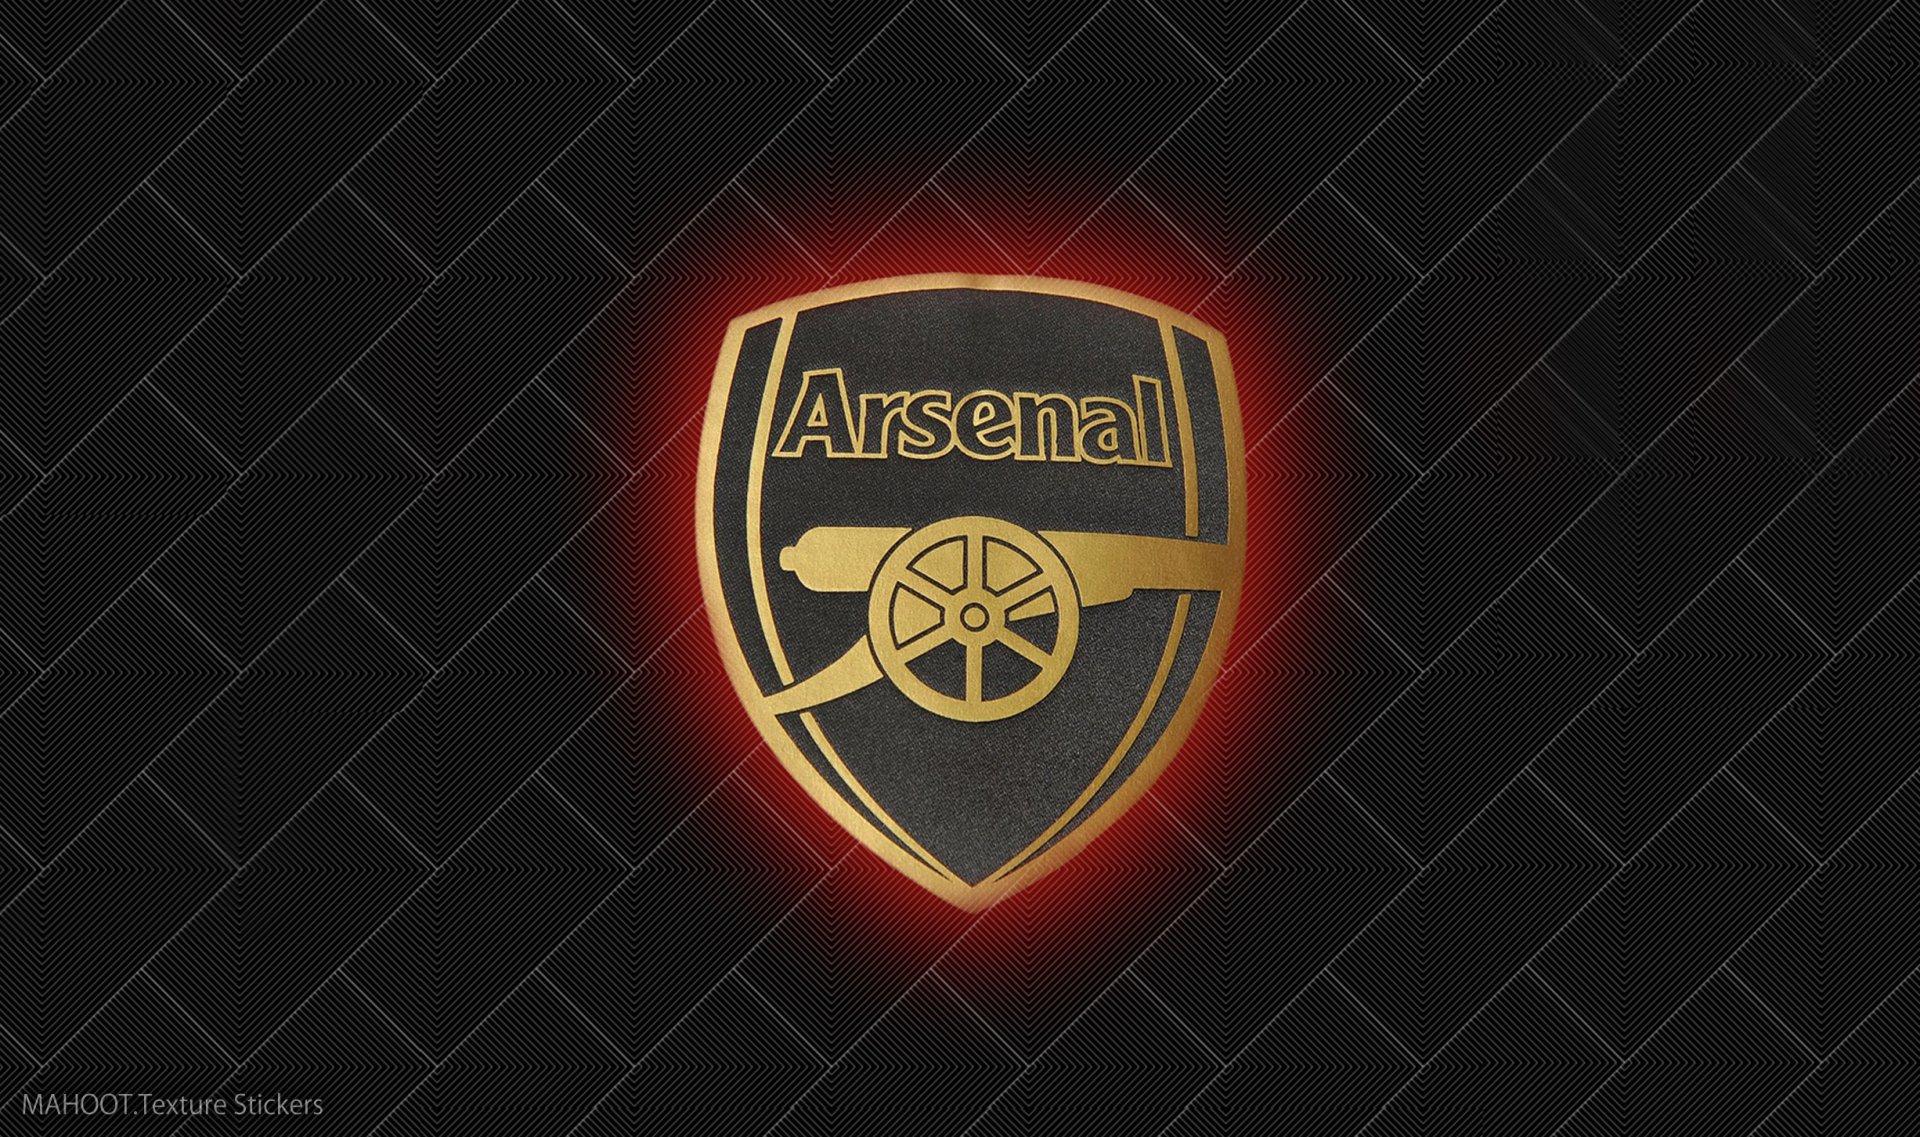 Arsenal F.C. HD Wallpaper   Background Image   2452x1452 ...